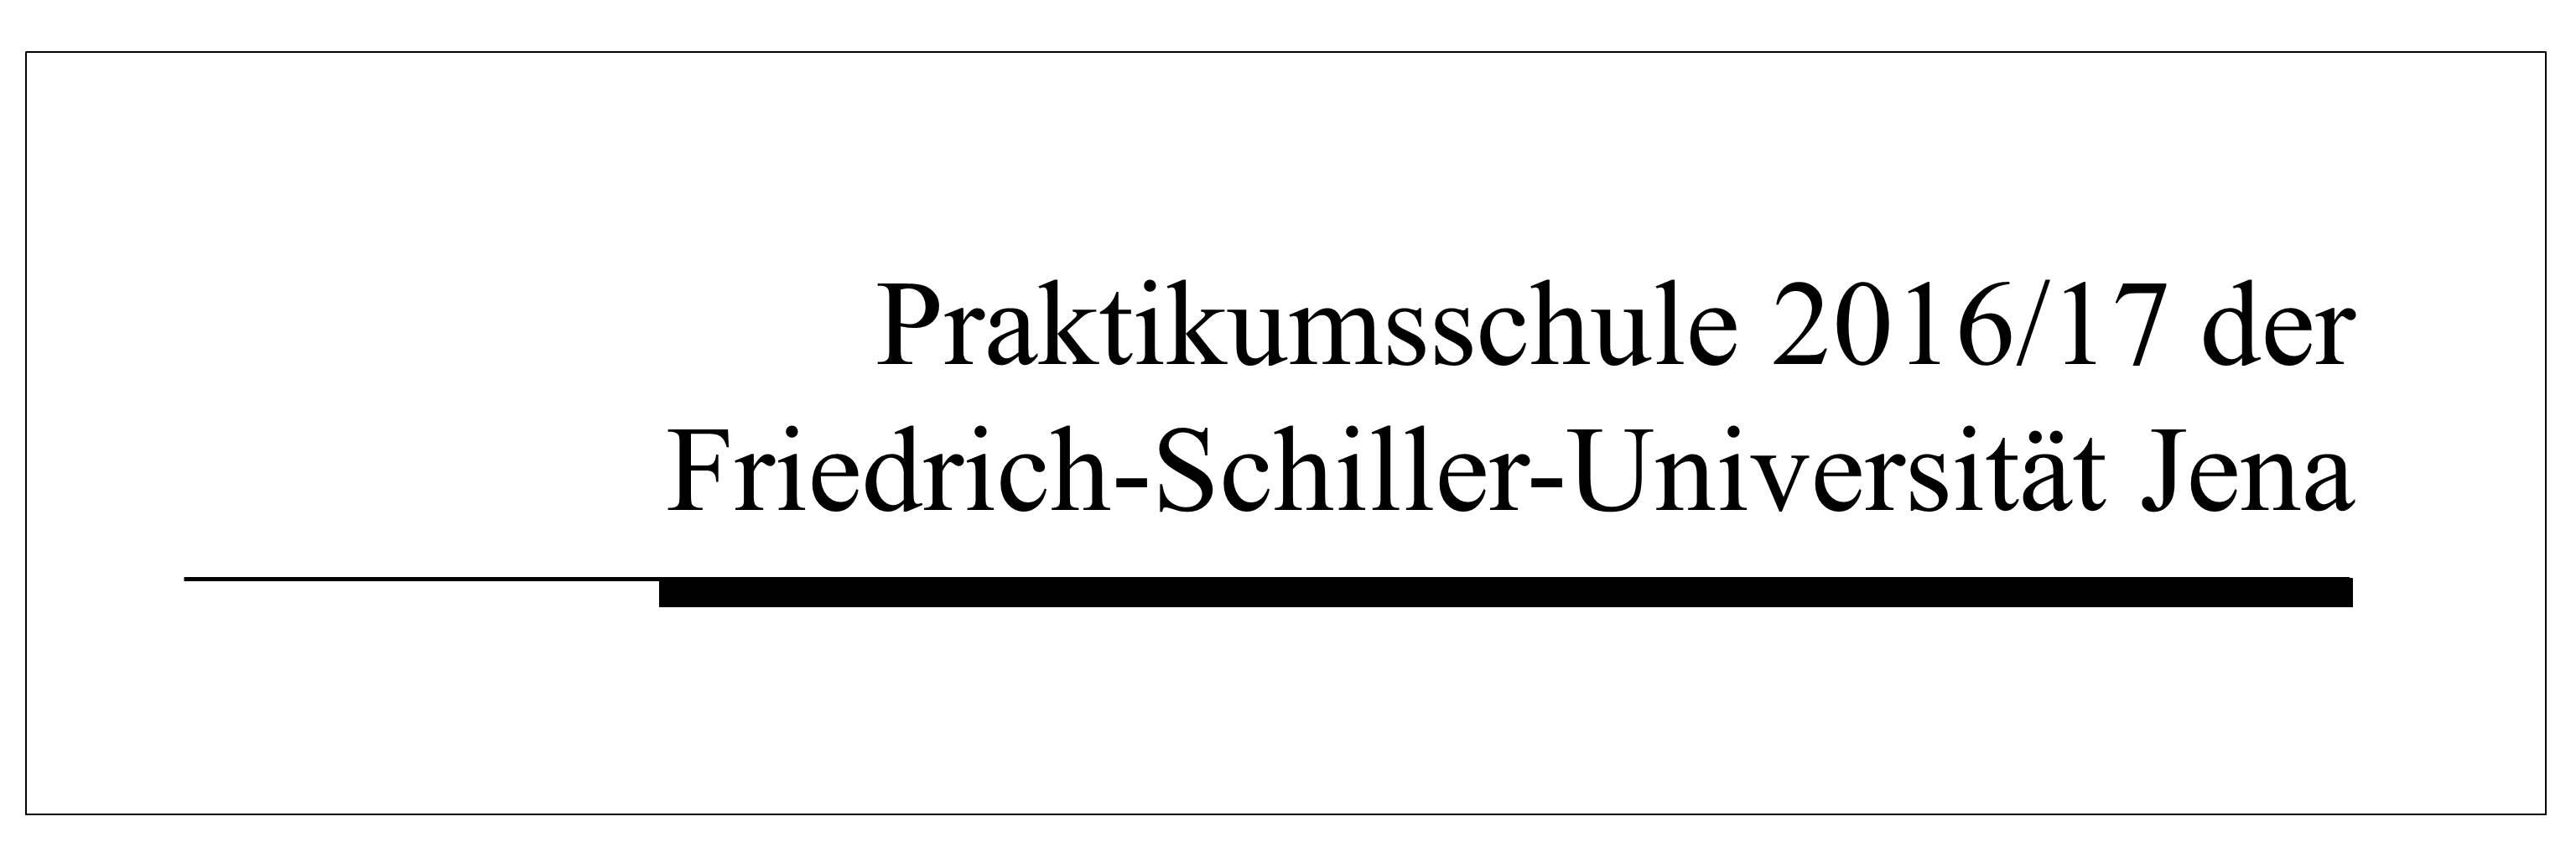 Praktikumsschule - Uni Jena